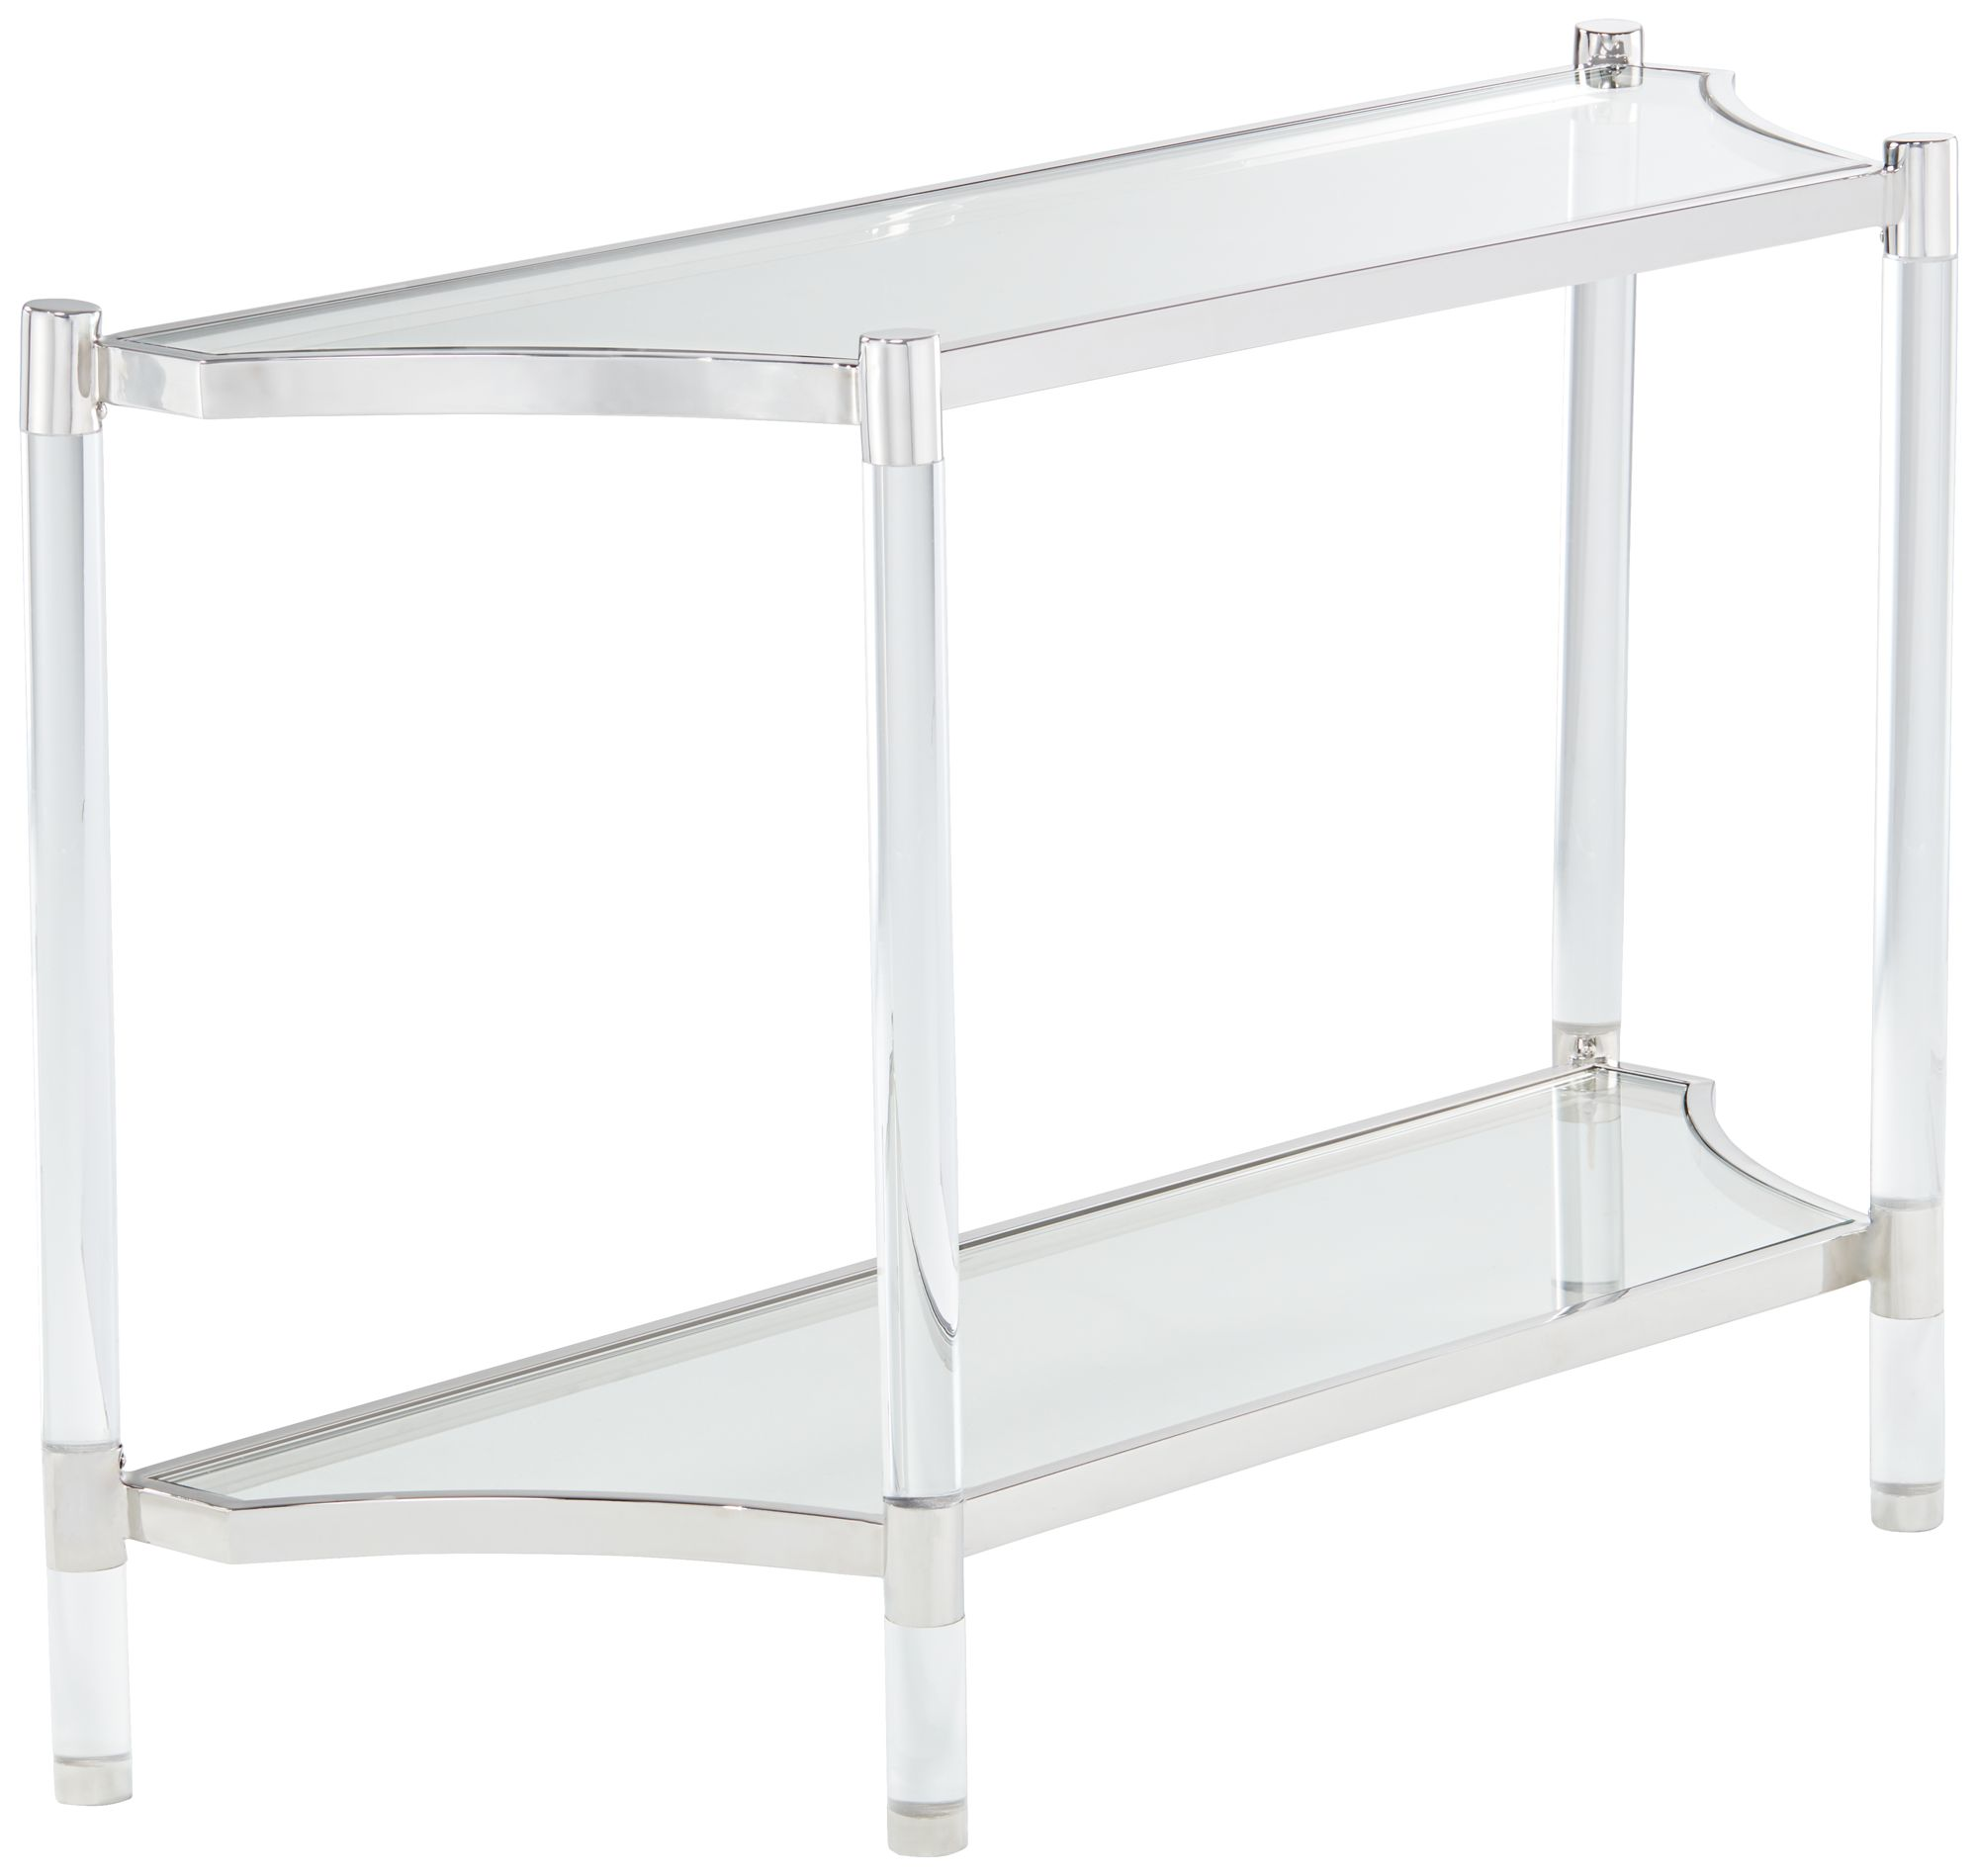 Acrylic console table acrylic console table singapore amazon erica clear acrylic console table geotapseo Gallery